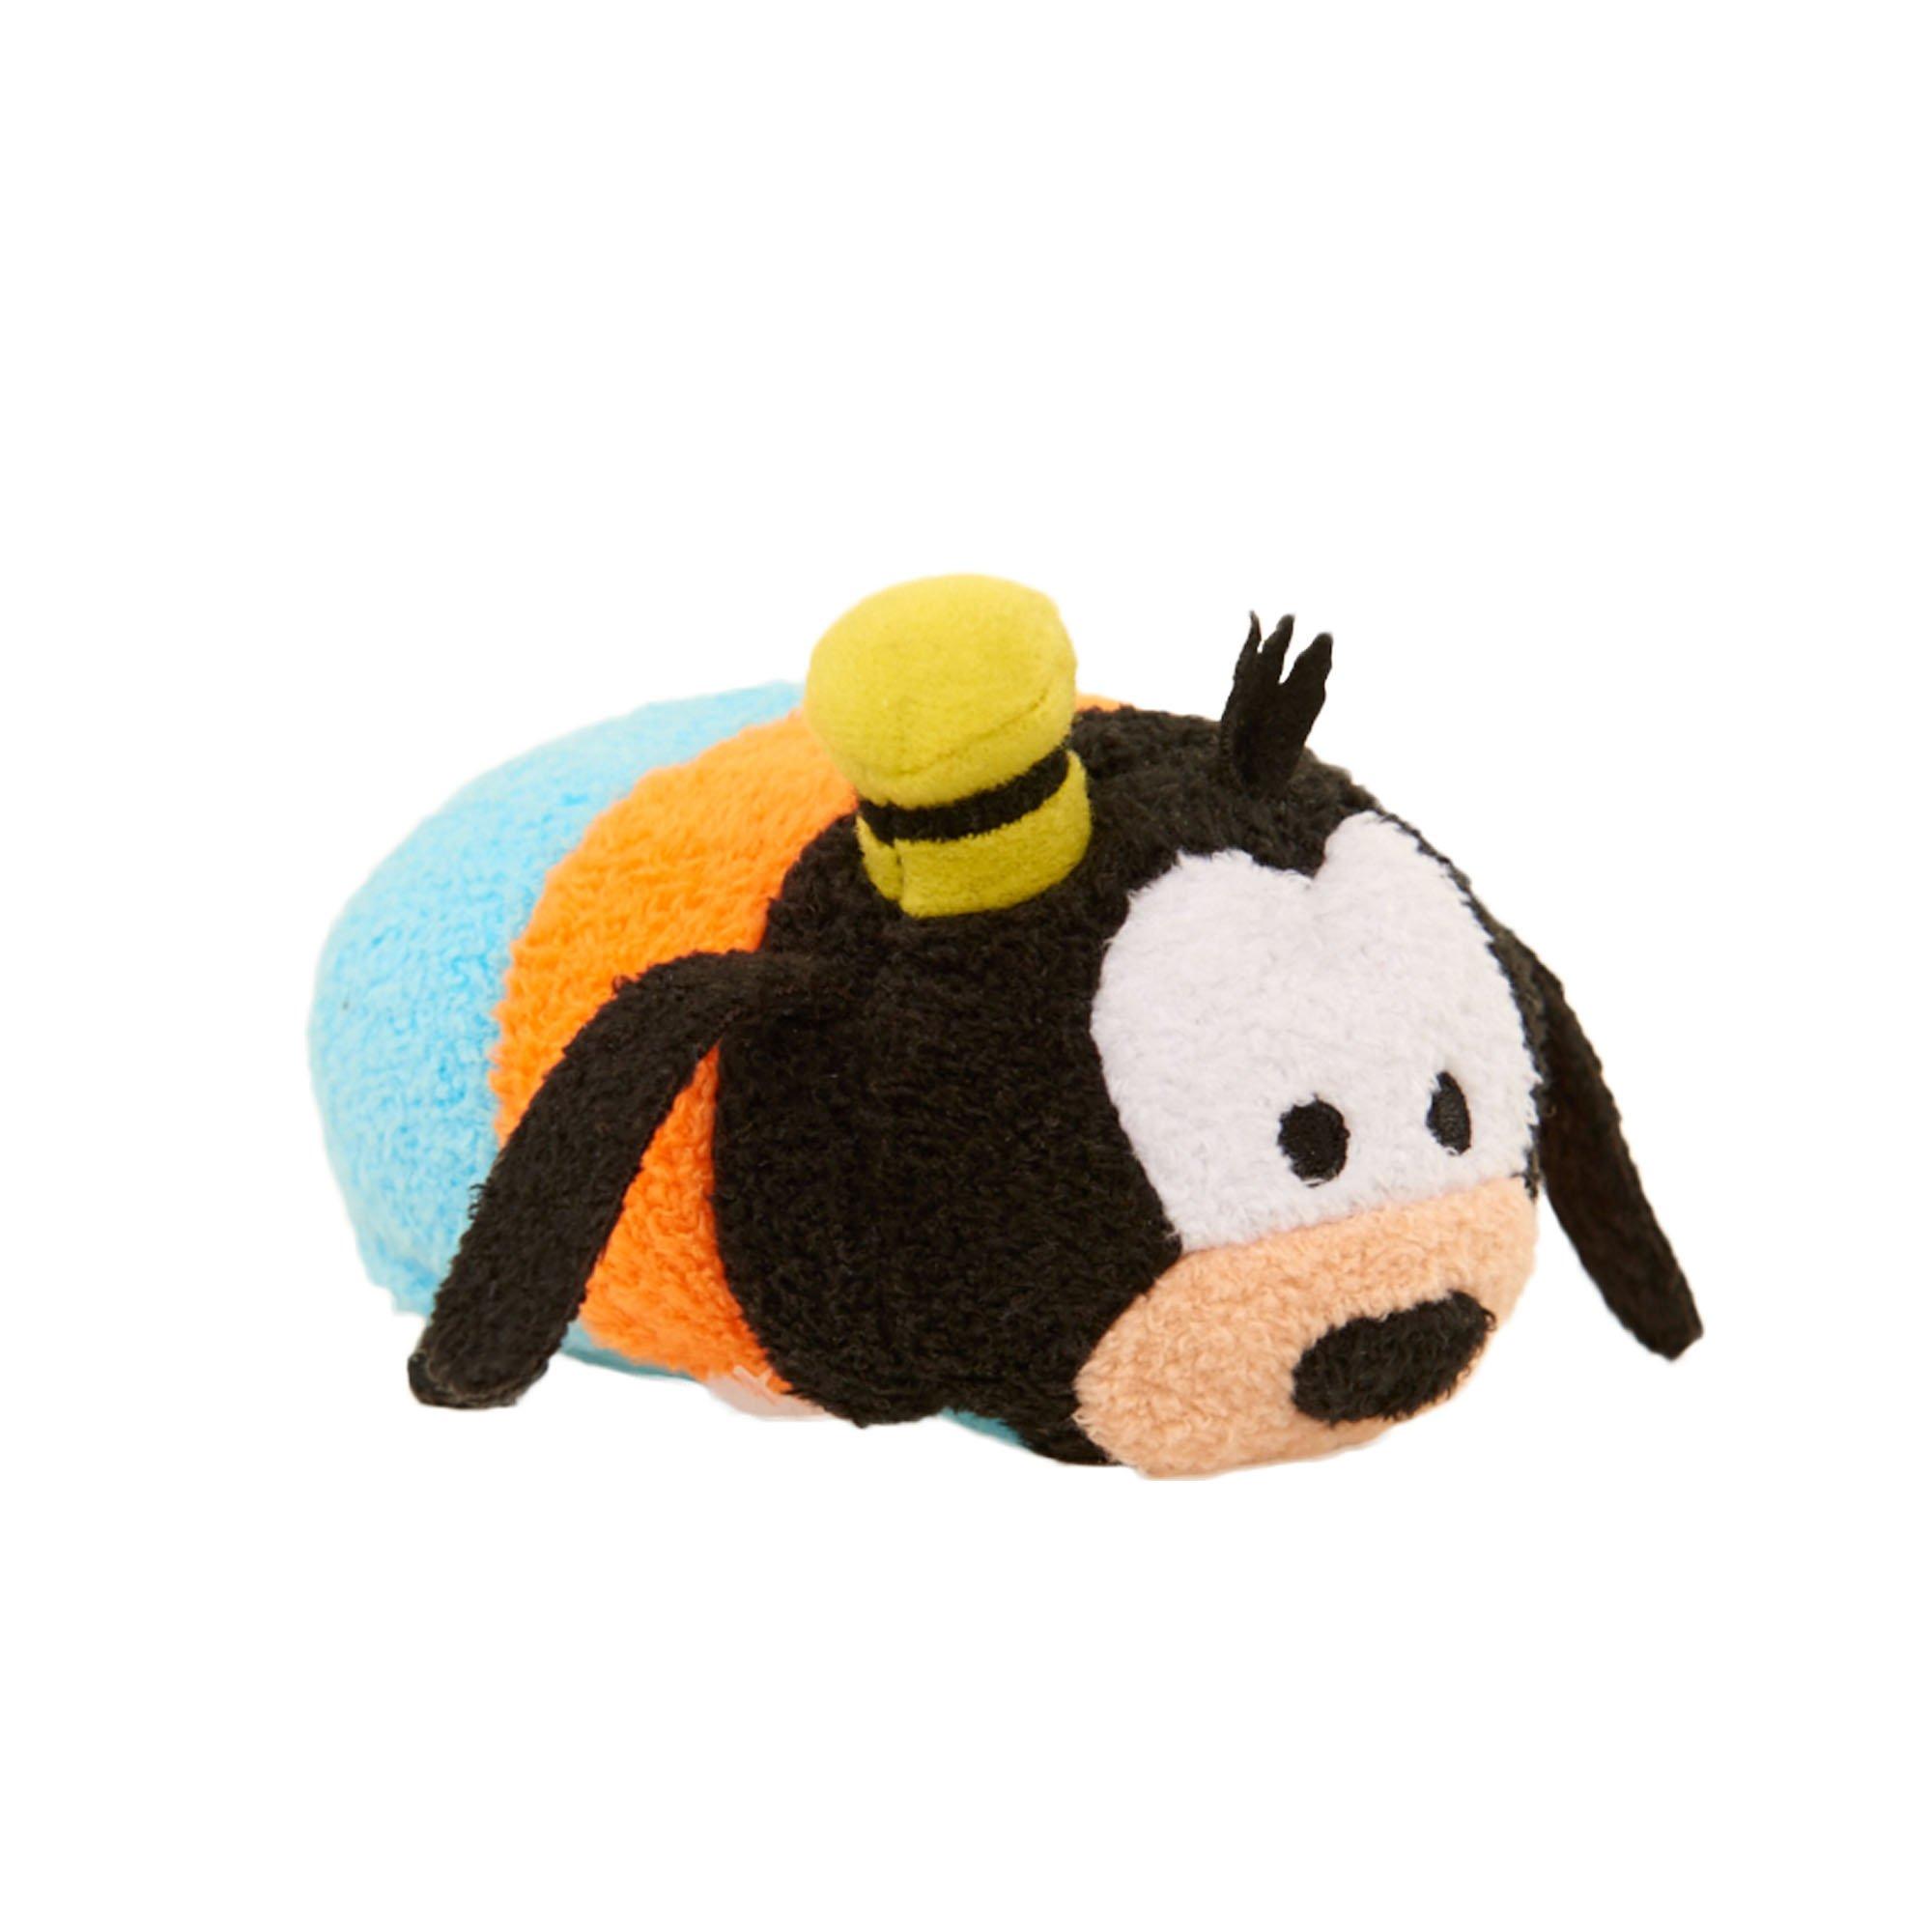 Disney Tsum Tsum Lights /& Sounds Goofy